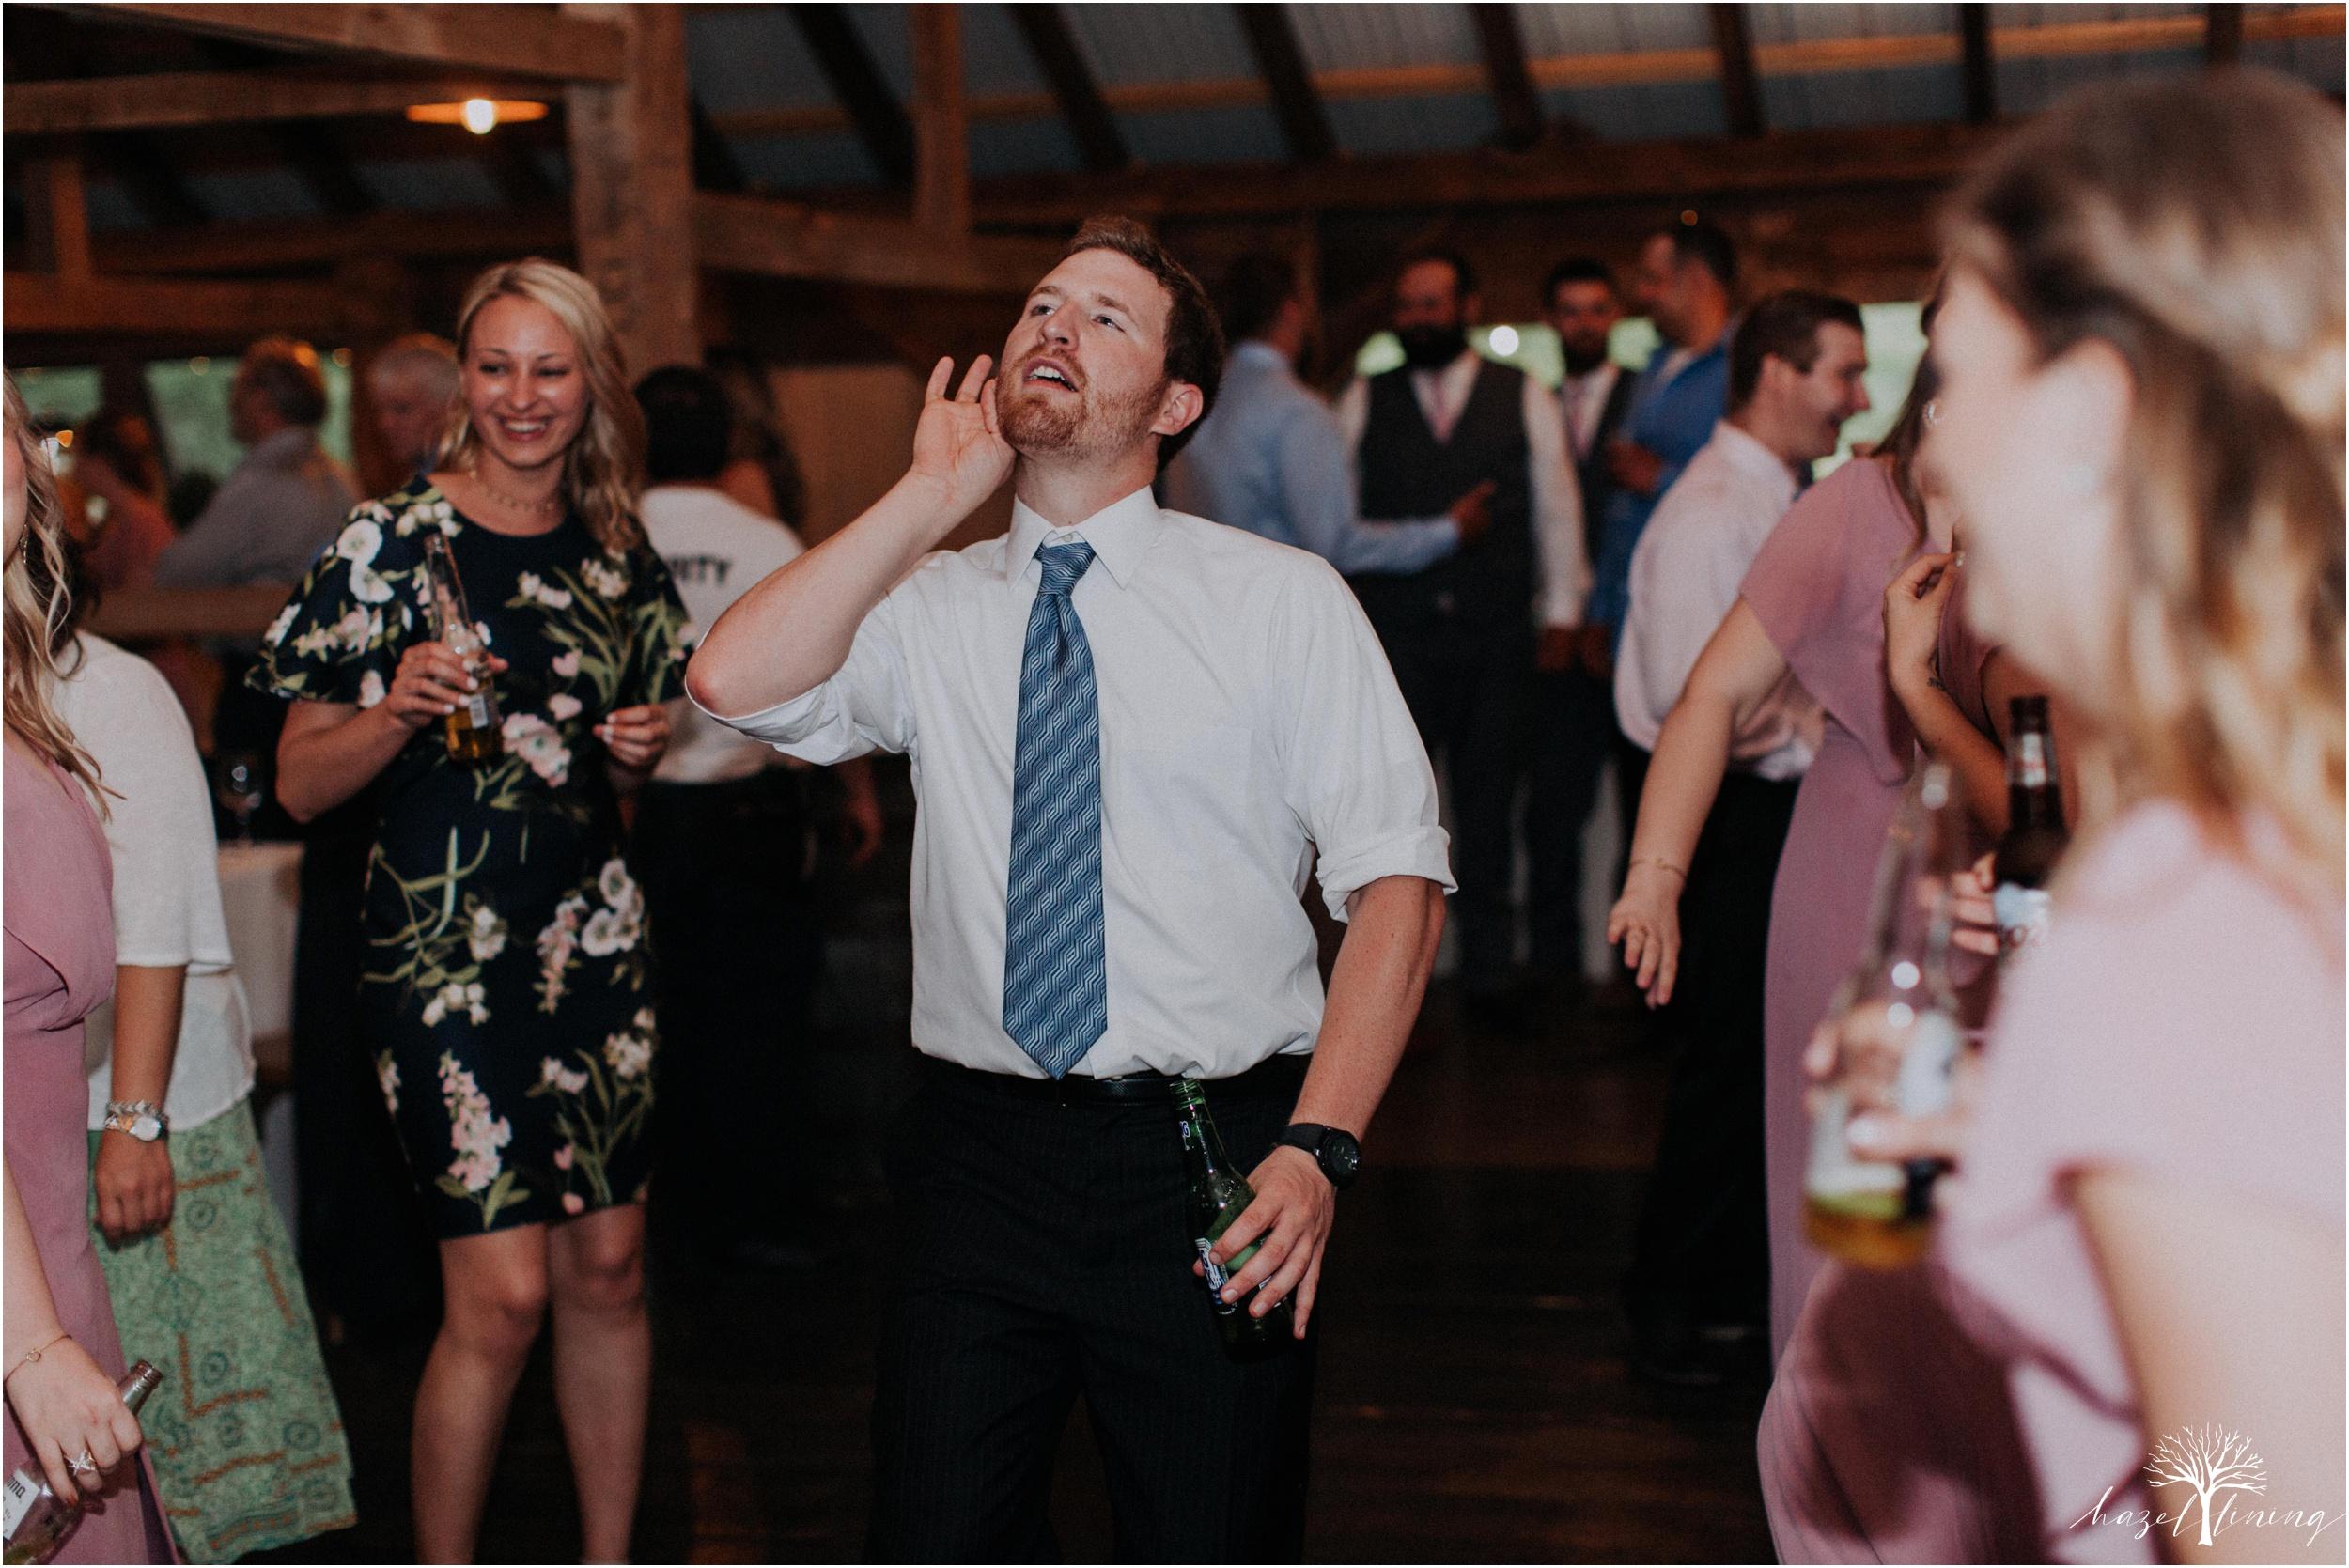 hazel-lining-travel-wedding-elopement-photography-lisa-landon-shoemaker-the-farm-bakery-and-events-bucks-county-quakertown-pennsylvania-summer-country-outdoor-farm-wedding_0149.jpg